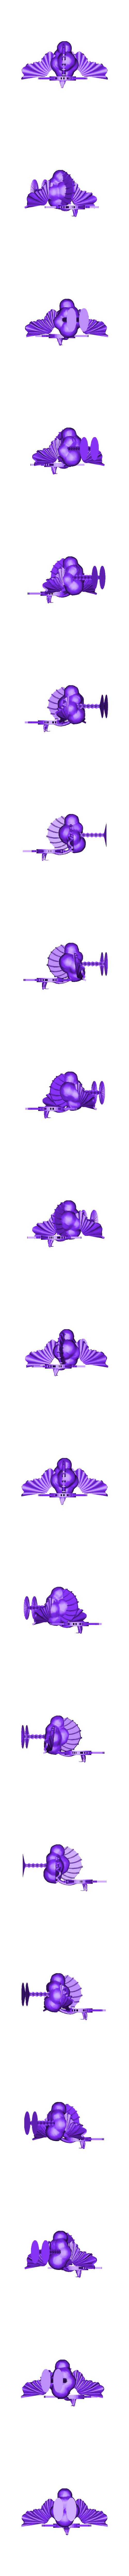 snakecloudstrusch3fix.stl Télécharger fichier STL gratuit serpent strauss • Design imprimable en 3D, syzguru11